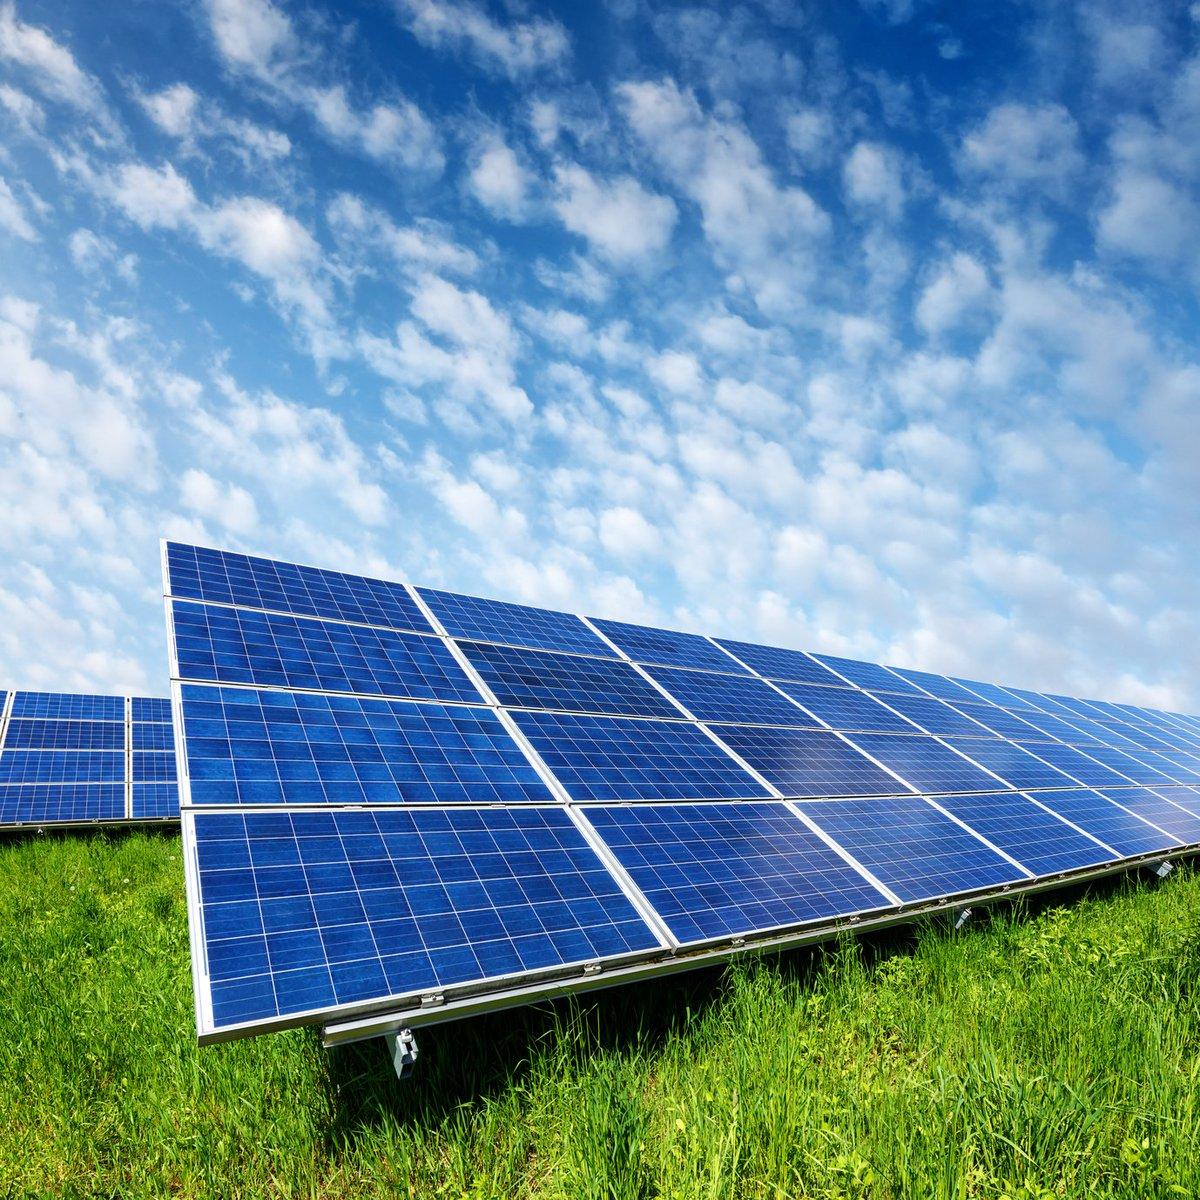 Solarpaneele ans Netz bringen